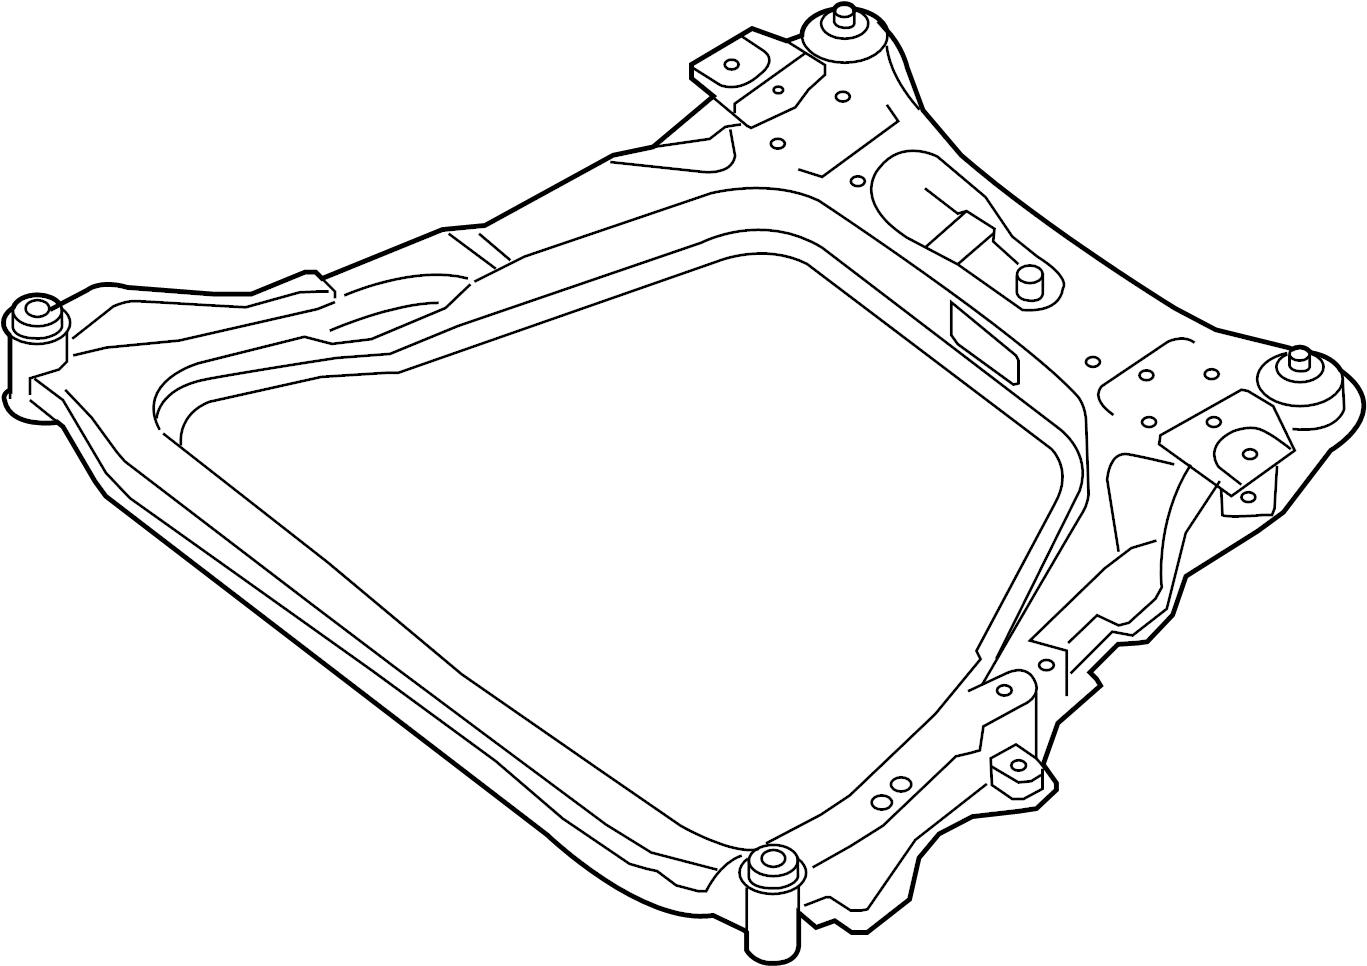 544004ba0a Nissan Center C Member Crossmember Engine